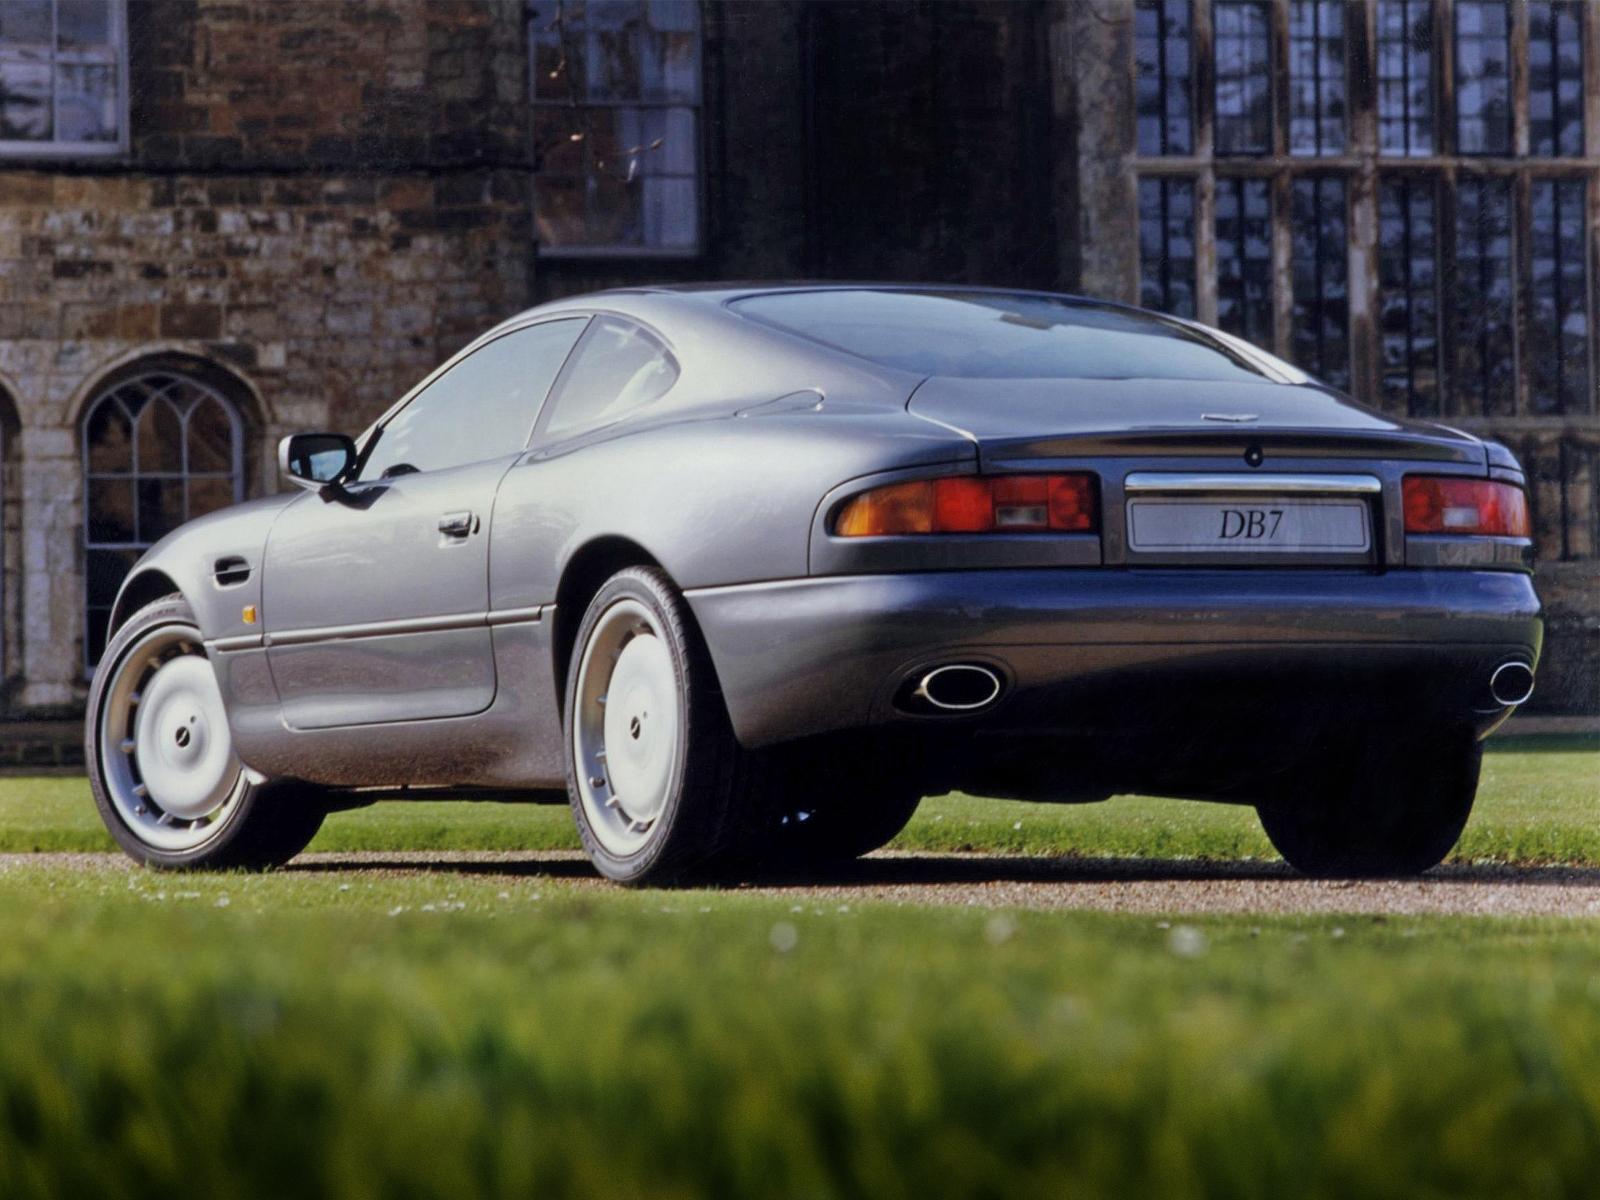 Aston Martin Db7 Scheda Tecnica